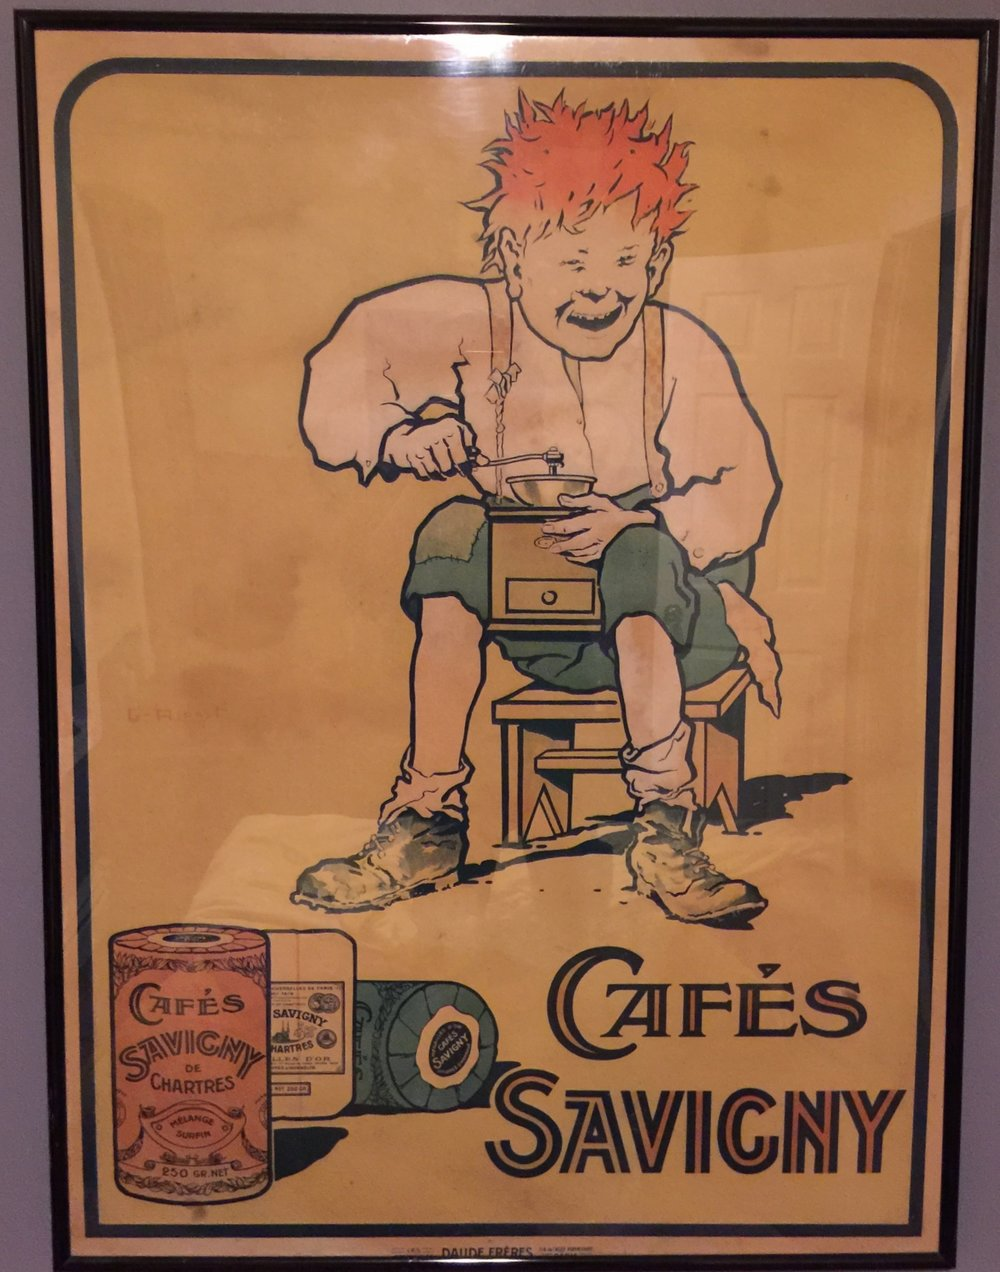 Georges Ripart - cafés Savigny ad by Daude Frères 1.JPG